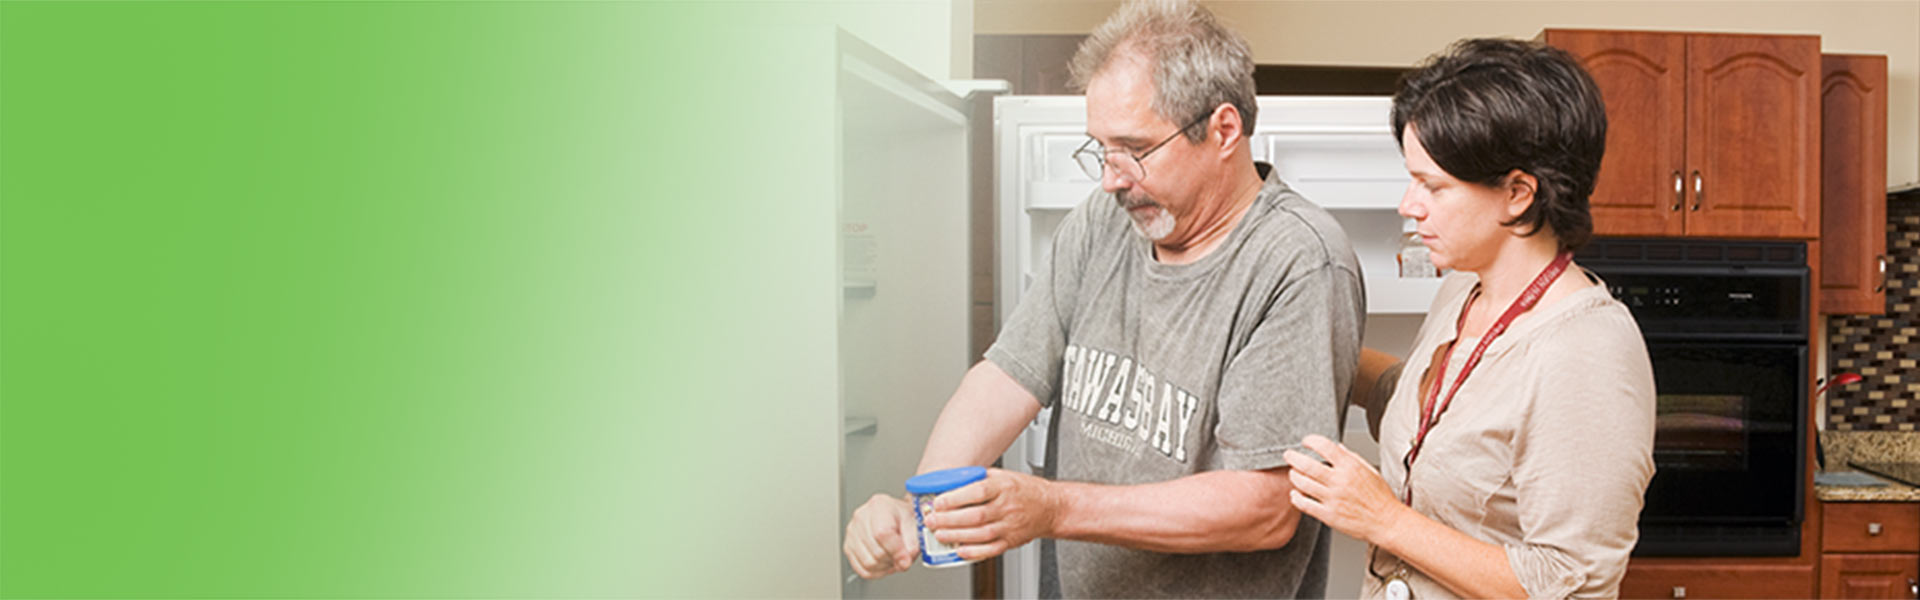 Home-based functional rehabilitation